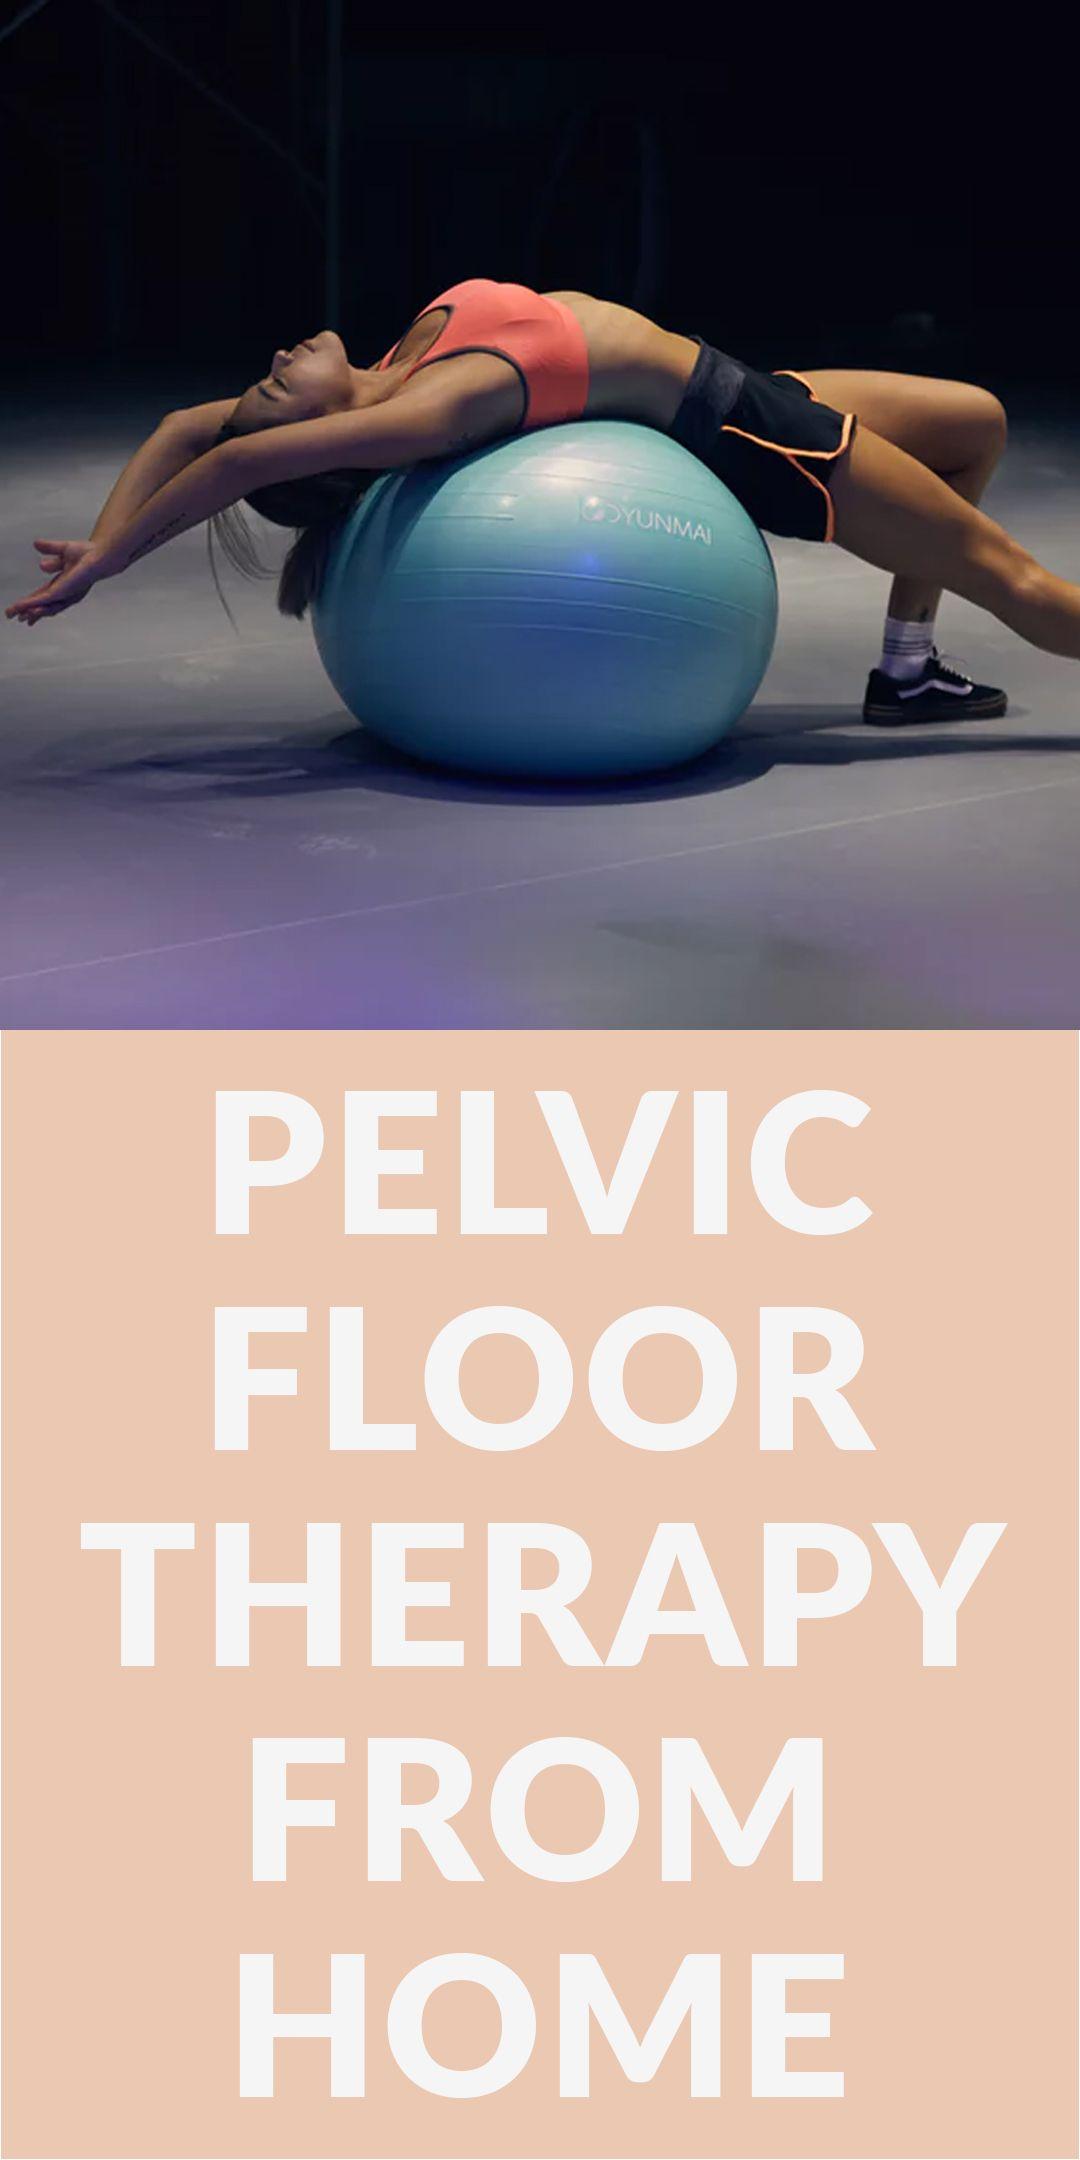 pelvic floor pelvic floor Exercises pelvic floor